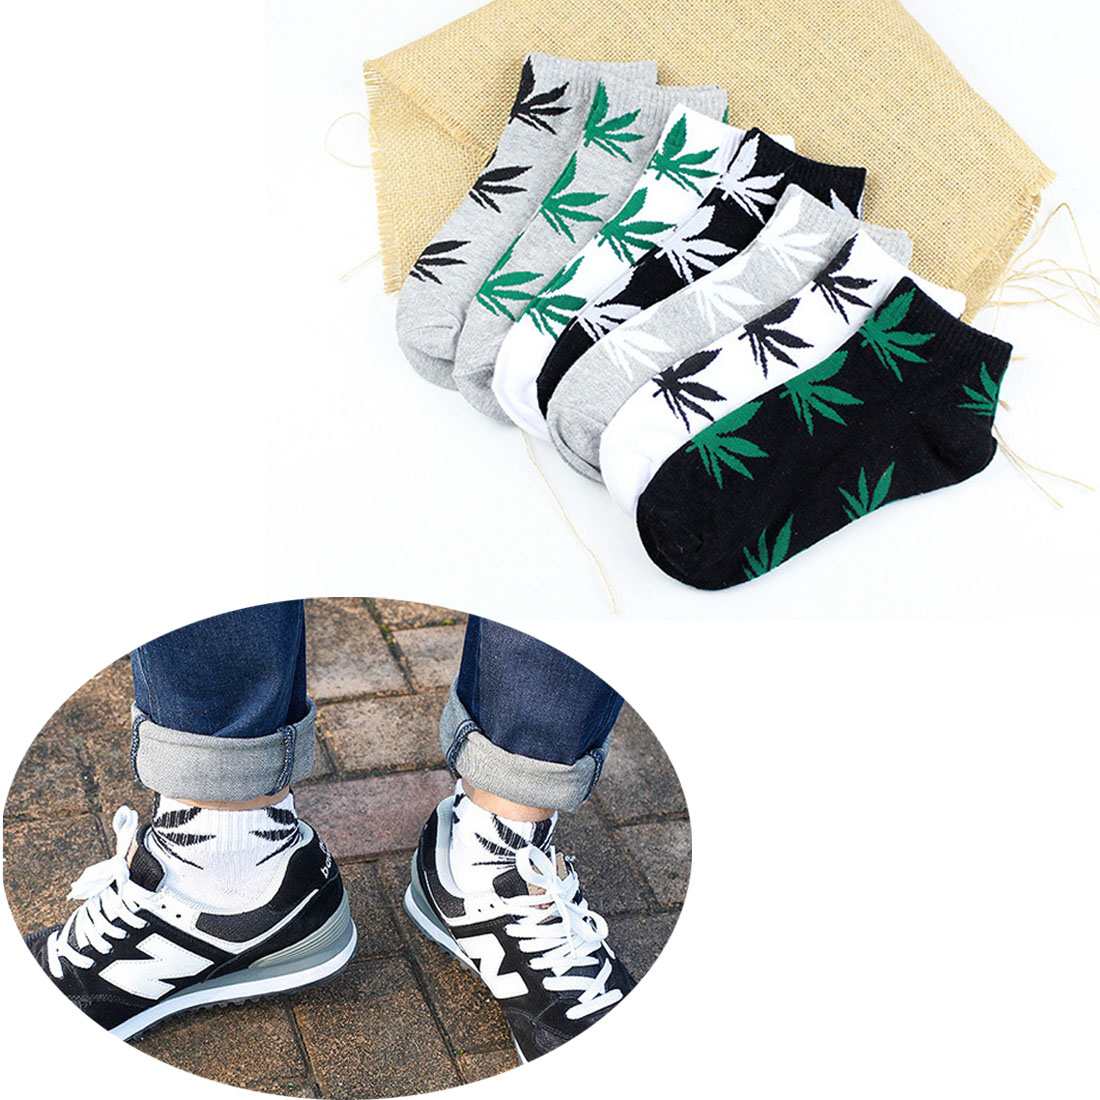 Mens Fashion Maple Low Cut Socks Printed Maple Leaf Sneakers Casuals Slippers Hot Ankle Non Slip Summer Everyday Men Socks in Men 39 s Socks from Underwear amp Sleepwears